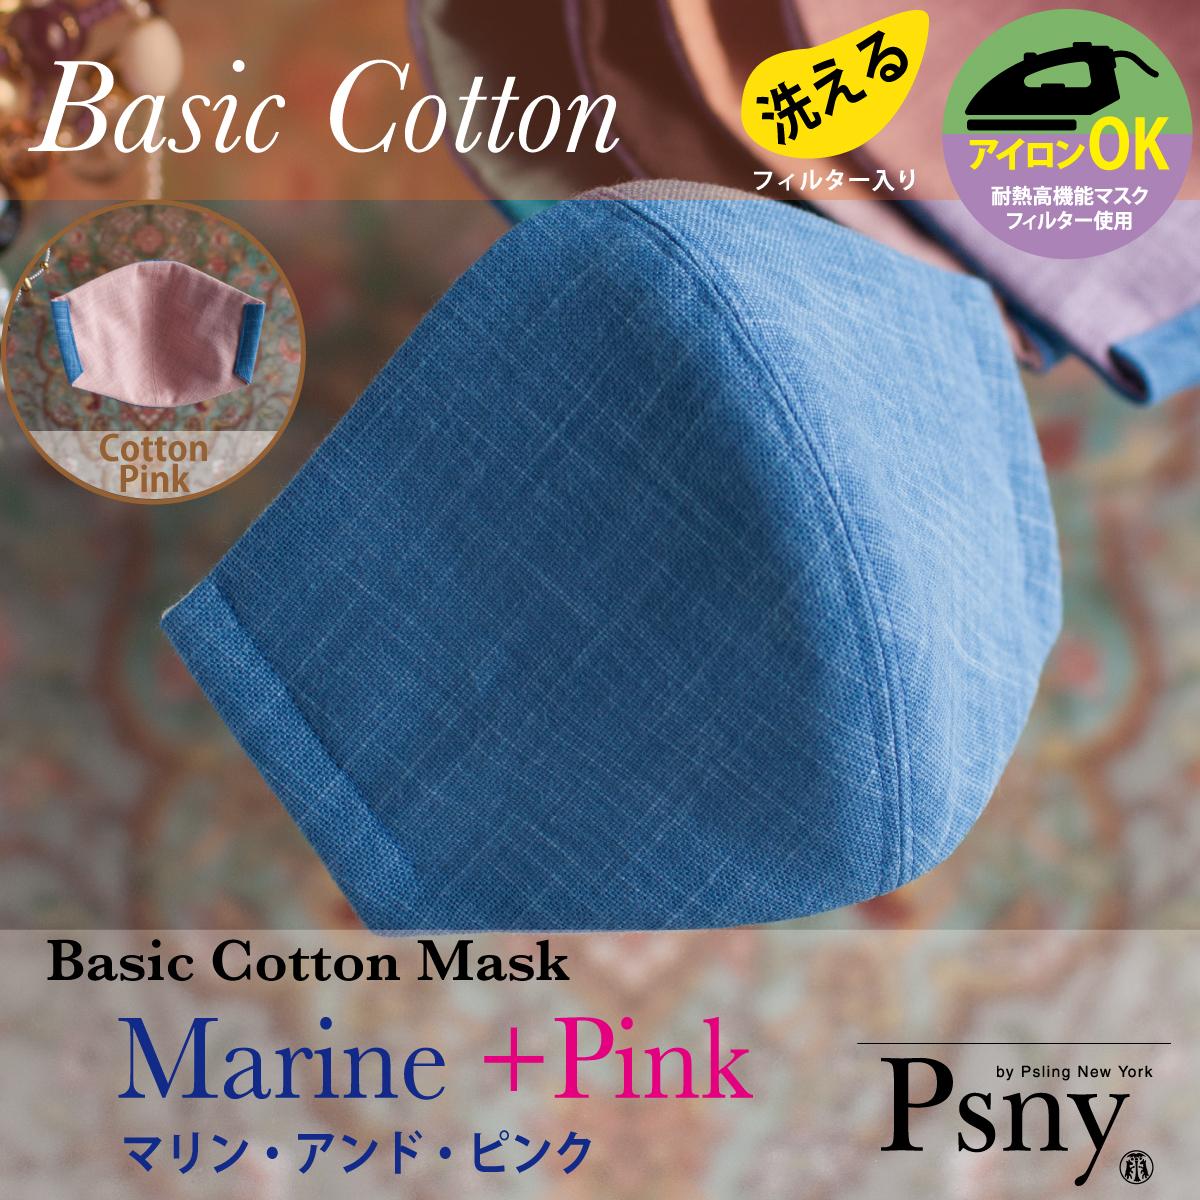 PSNY ベーシックコットン・マリン(&ピンク) 花粉 黄砂 洗えるフィルター入り 立体 マスク 大人用 CC5